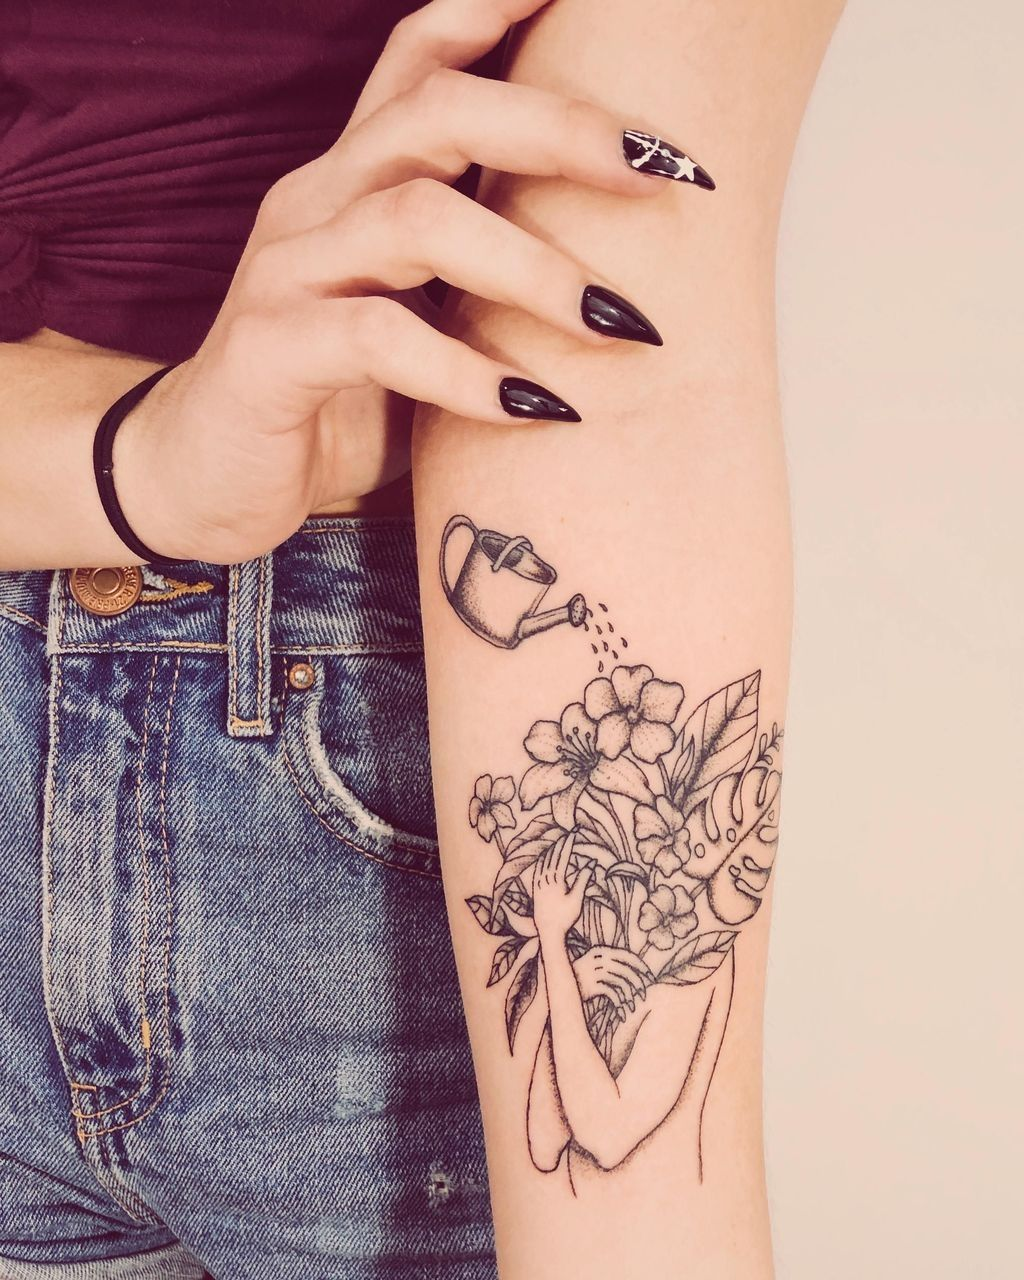 Cute Small Tattoo Designs For Girls Female Women (216)